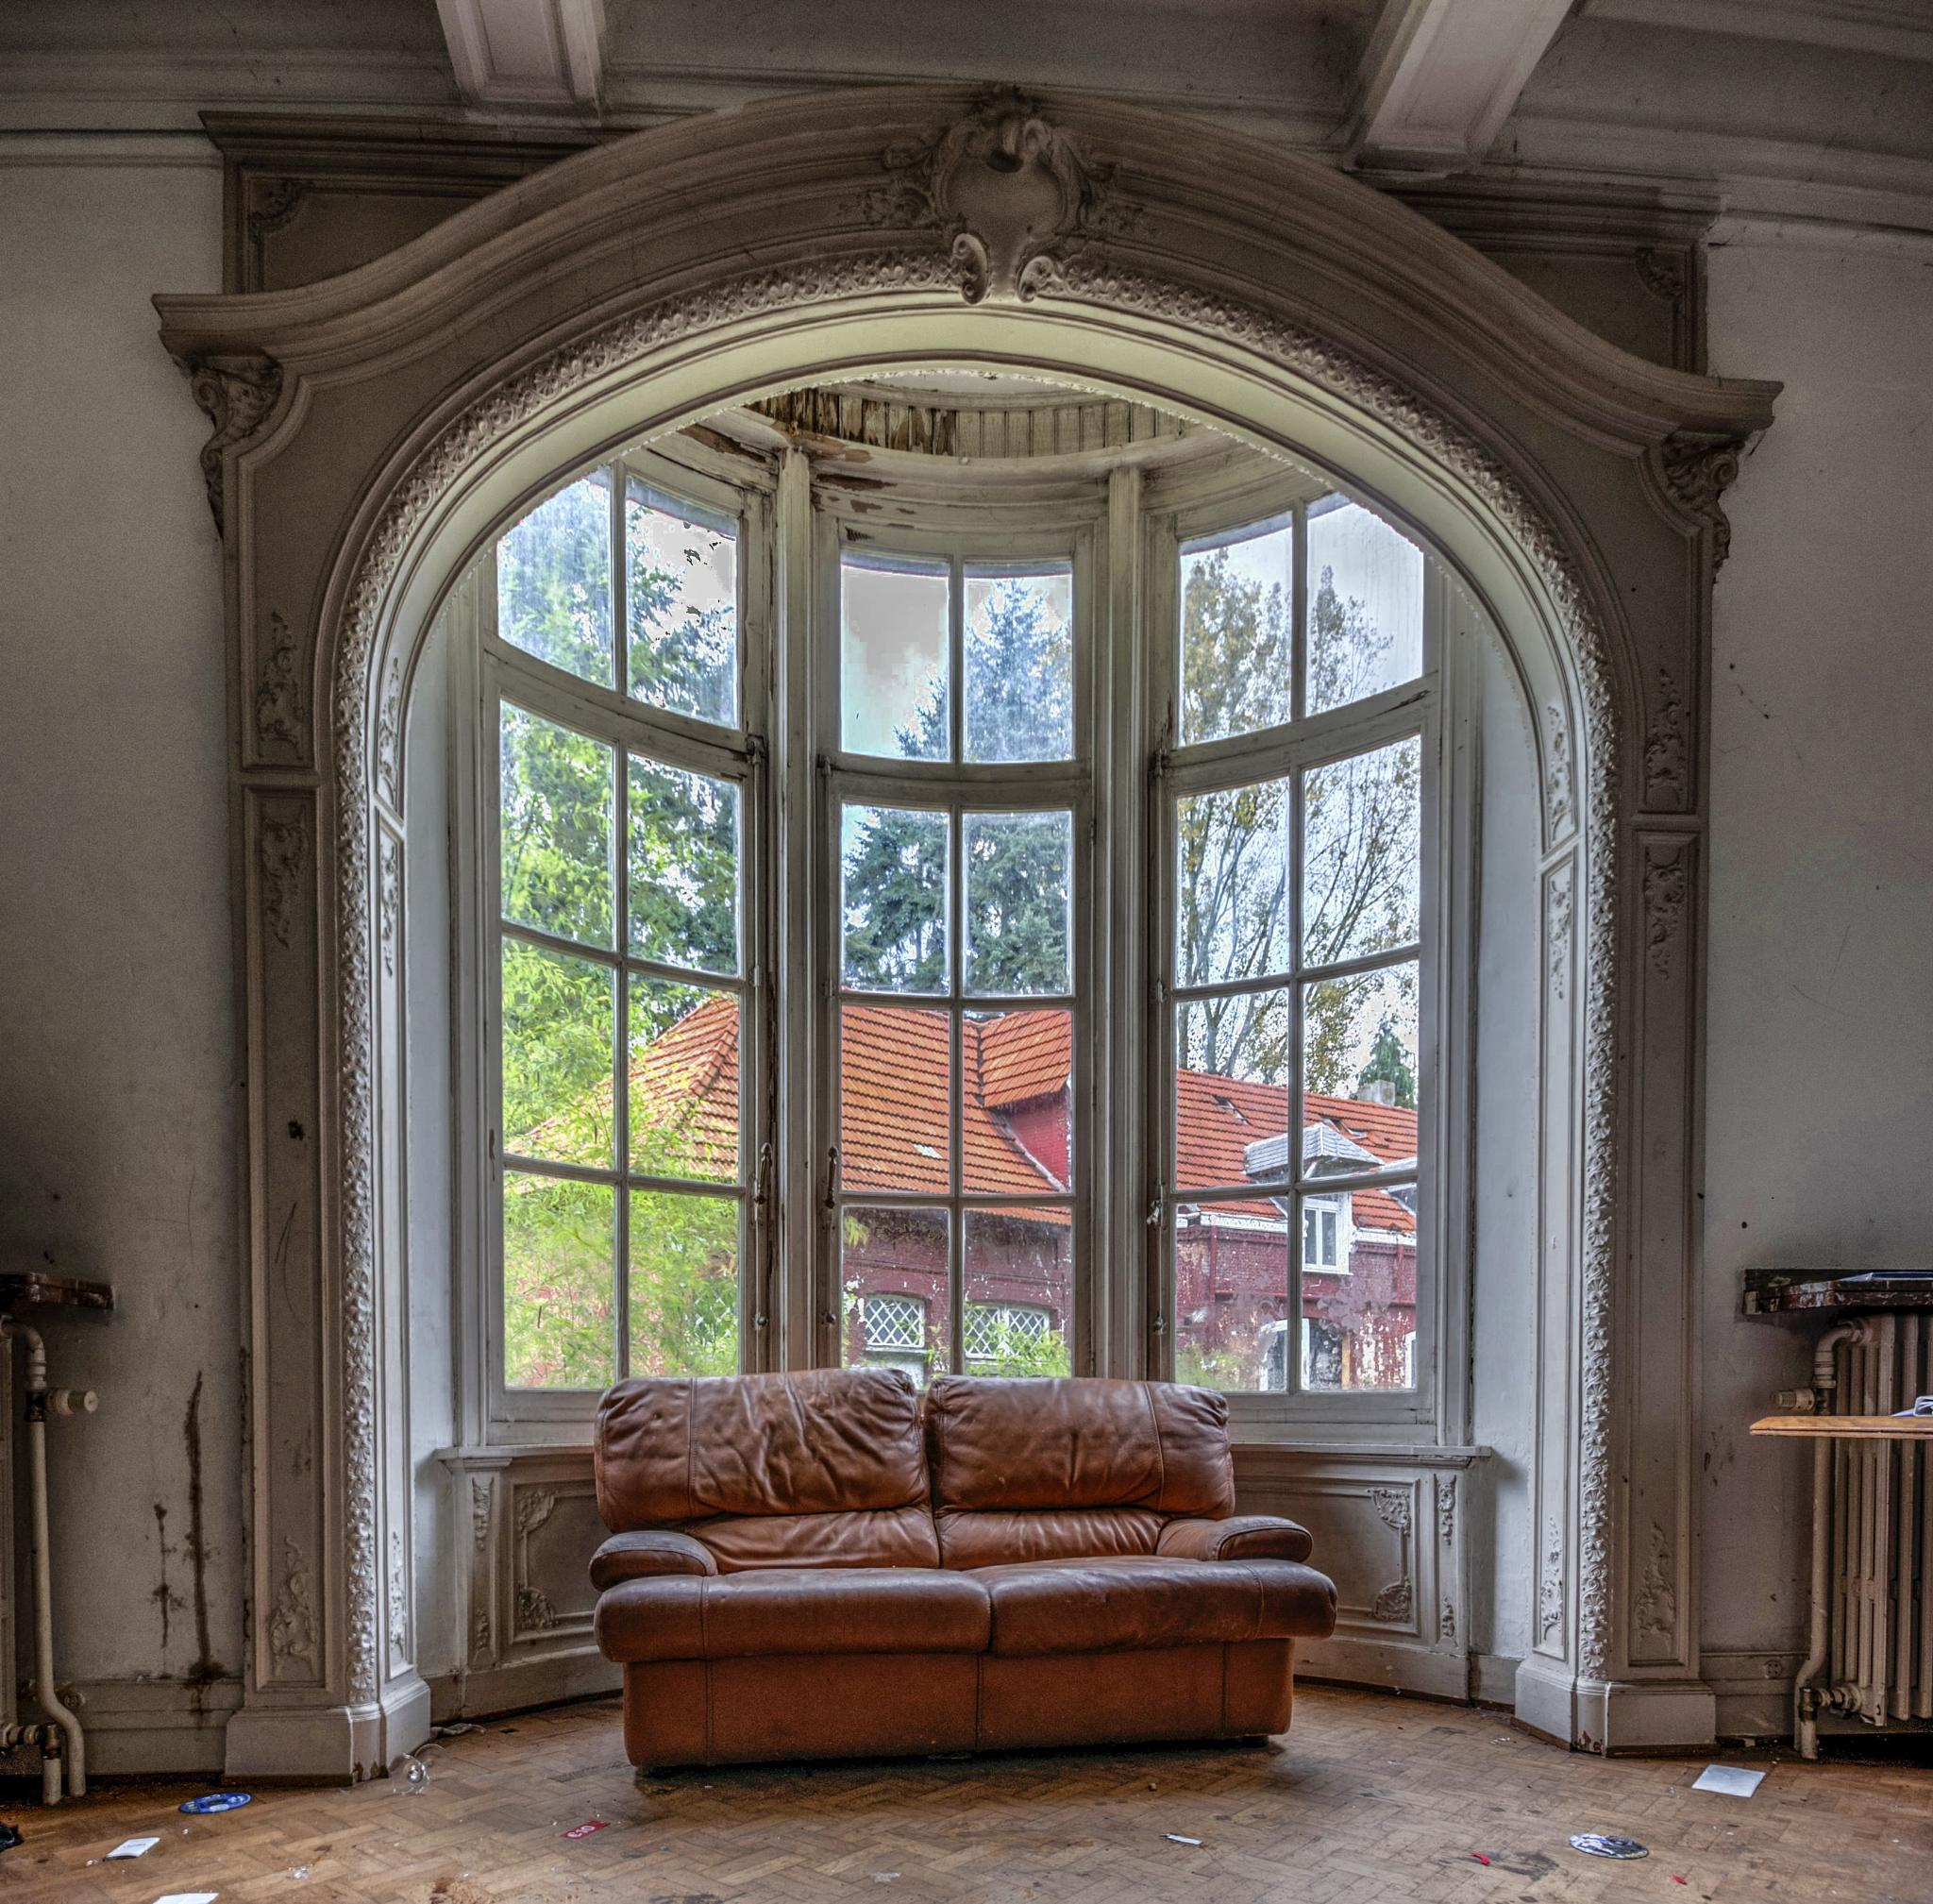 Inside the deacy - the comfty chair by Joël Arys